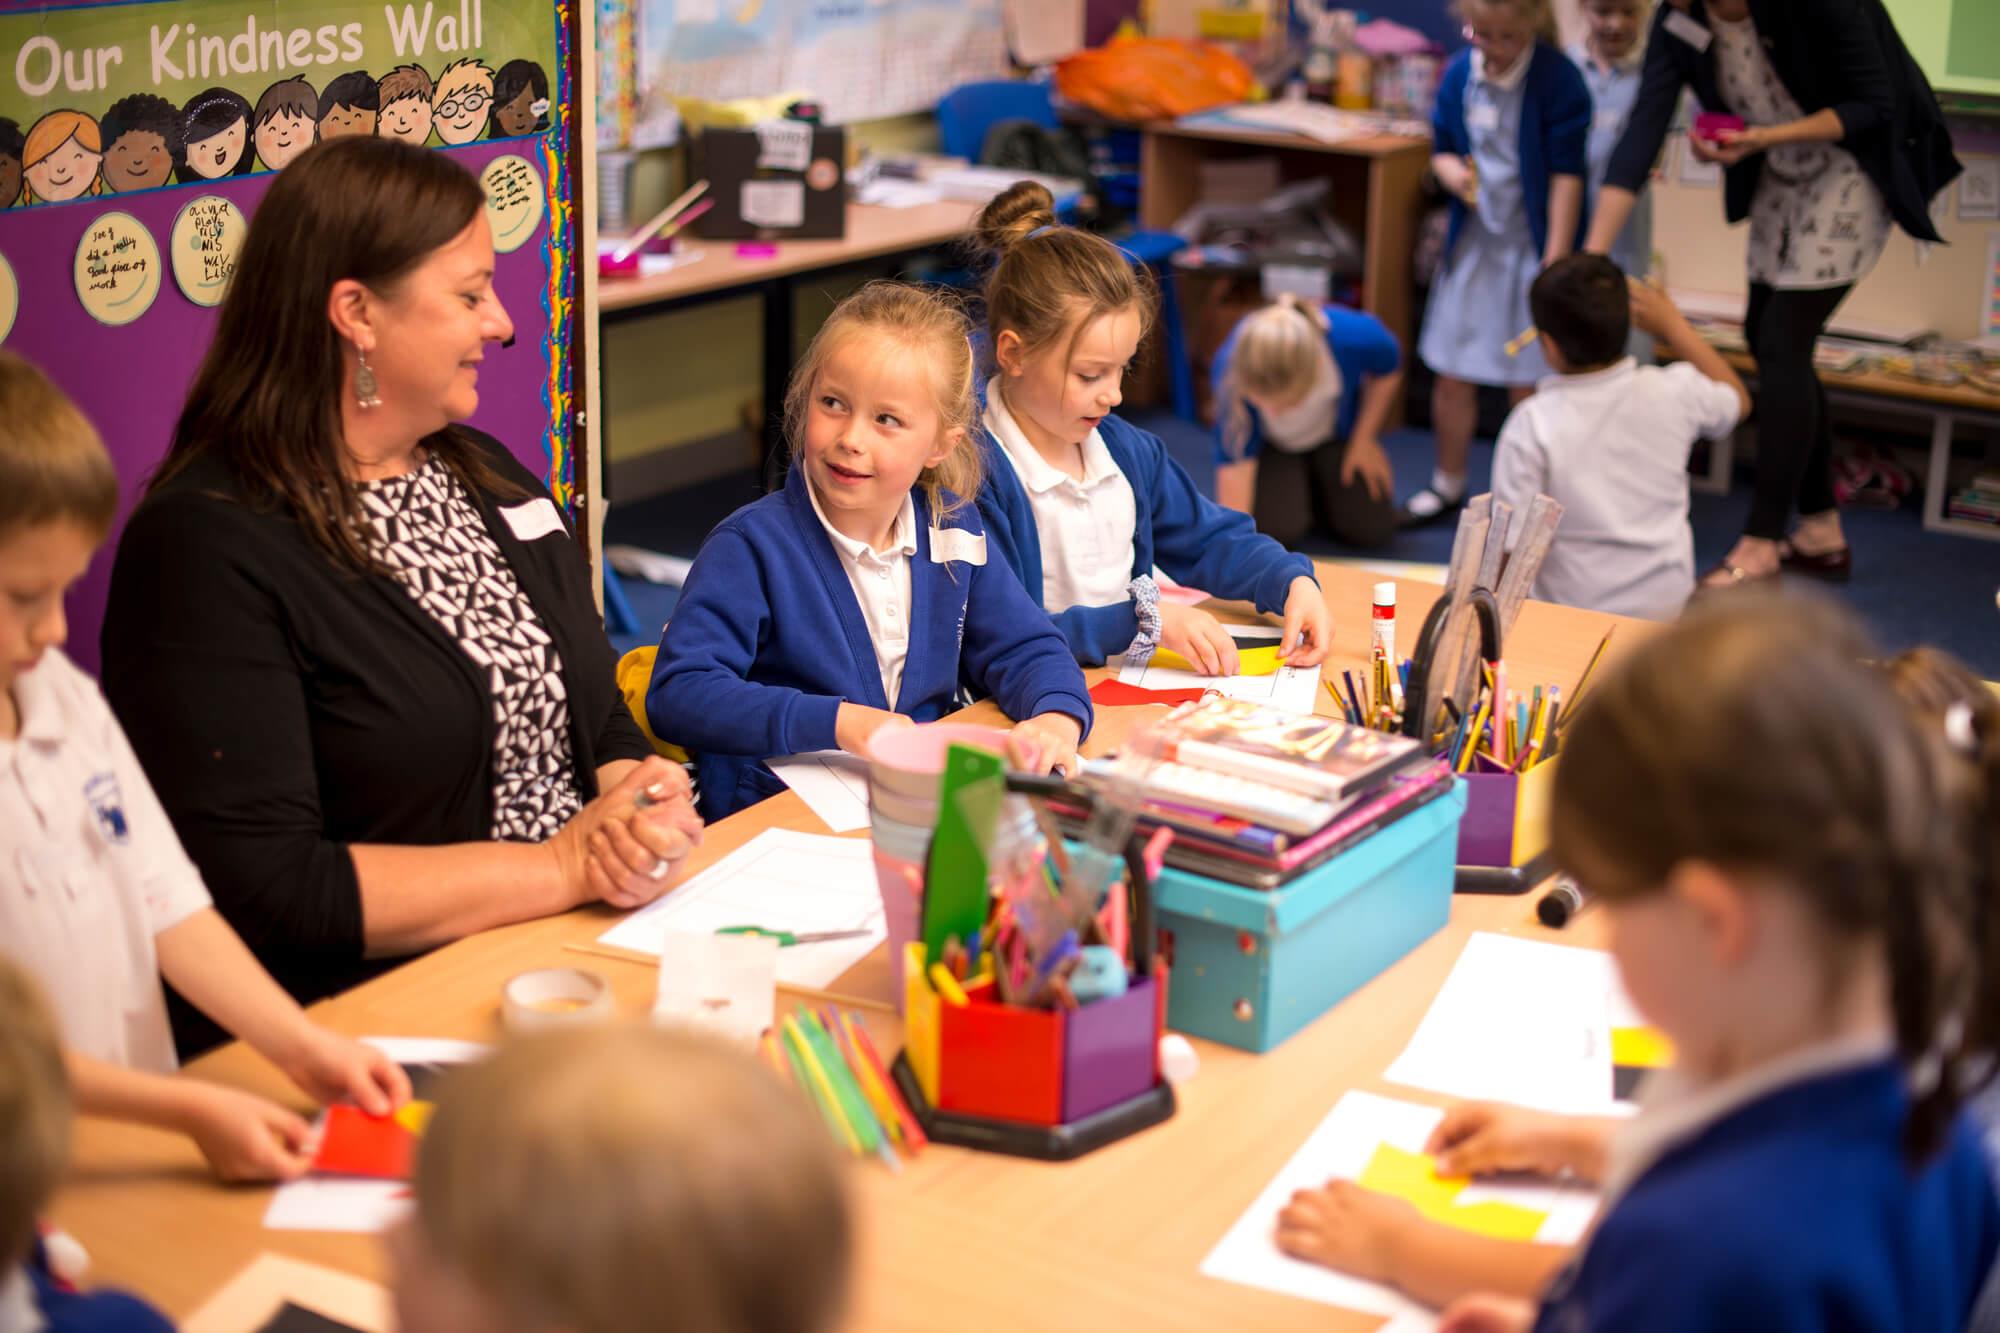 Primary school children engaging in an activity